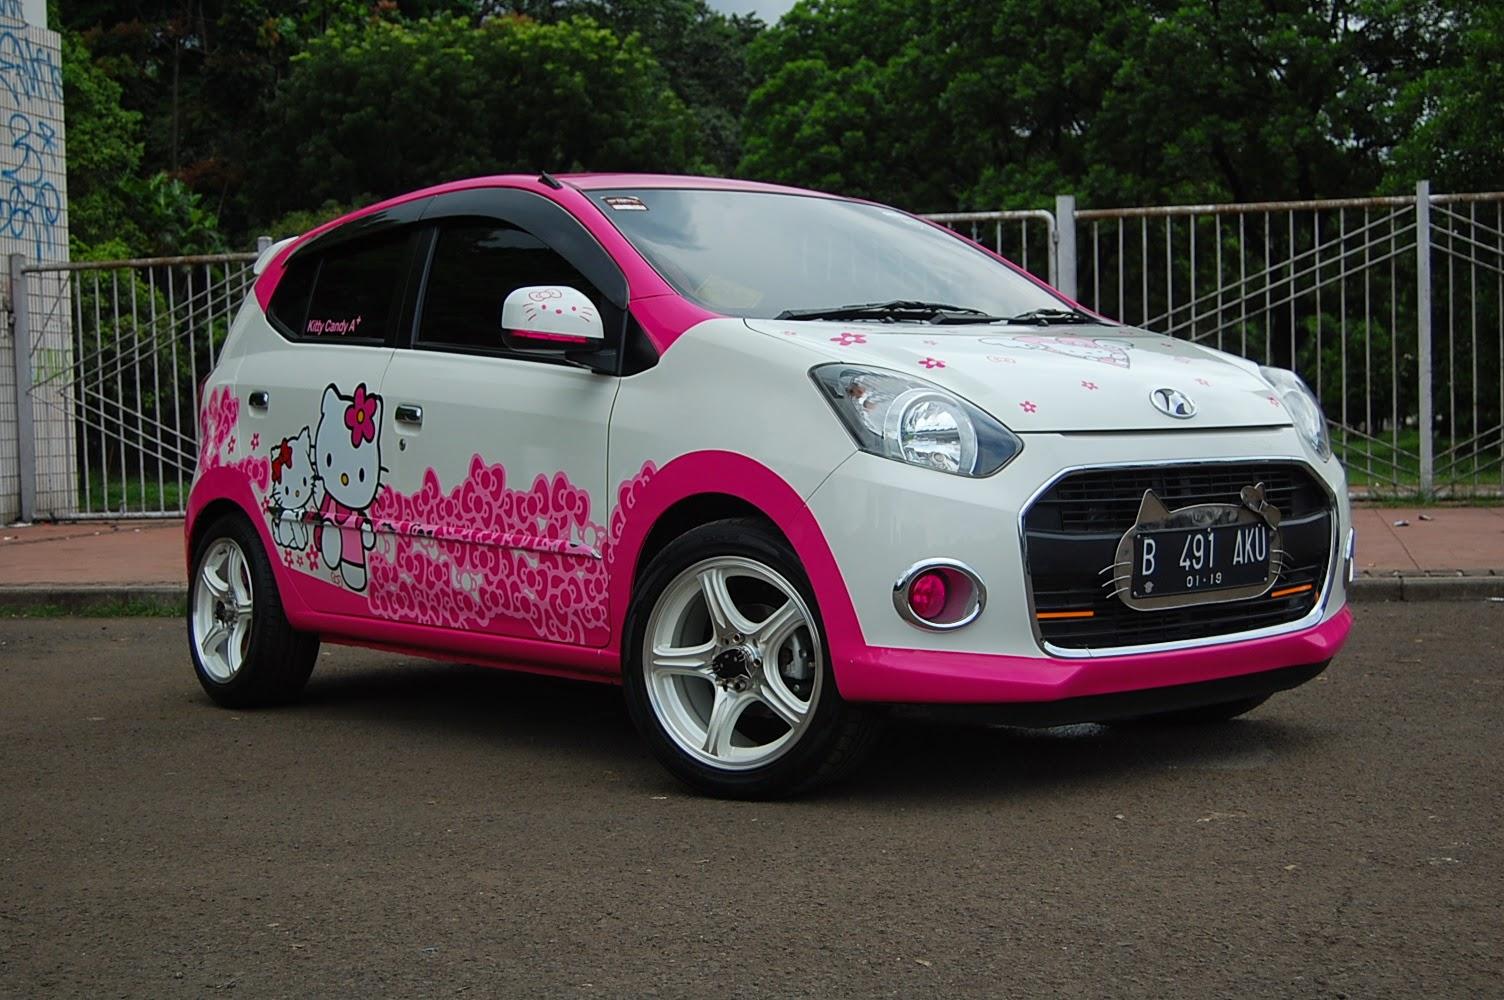 Modifikasi Unik Dan Lucu Mobil Murah Daihatsu Ayla 2013 Hello Kitty